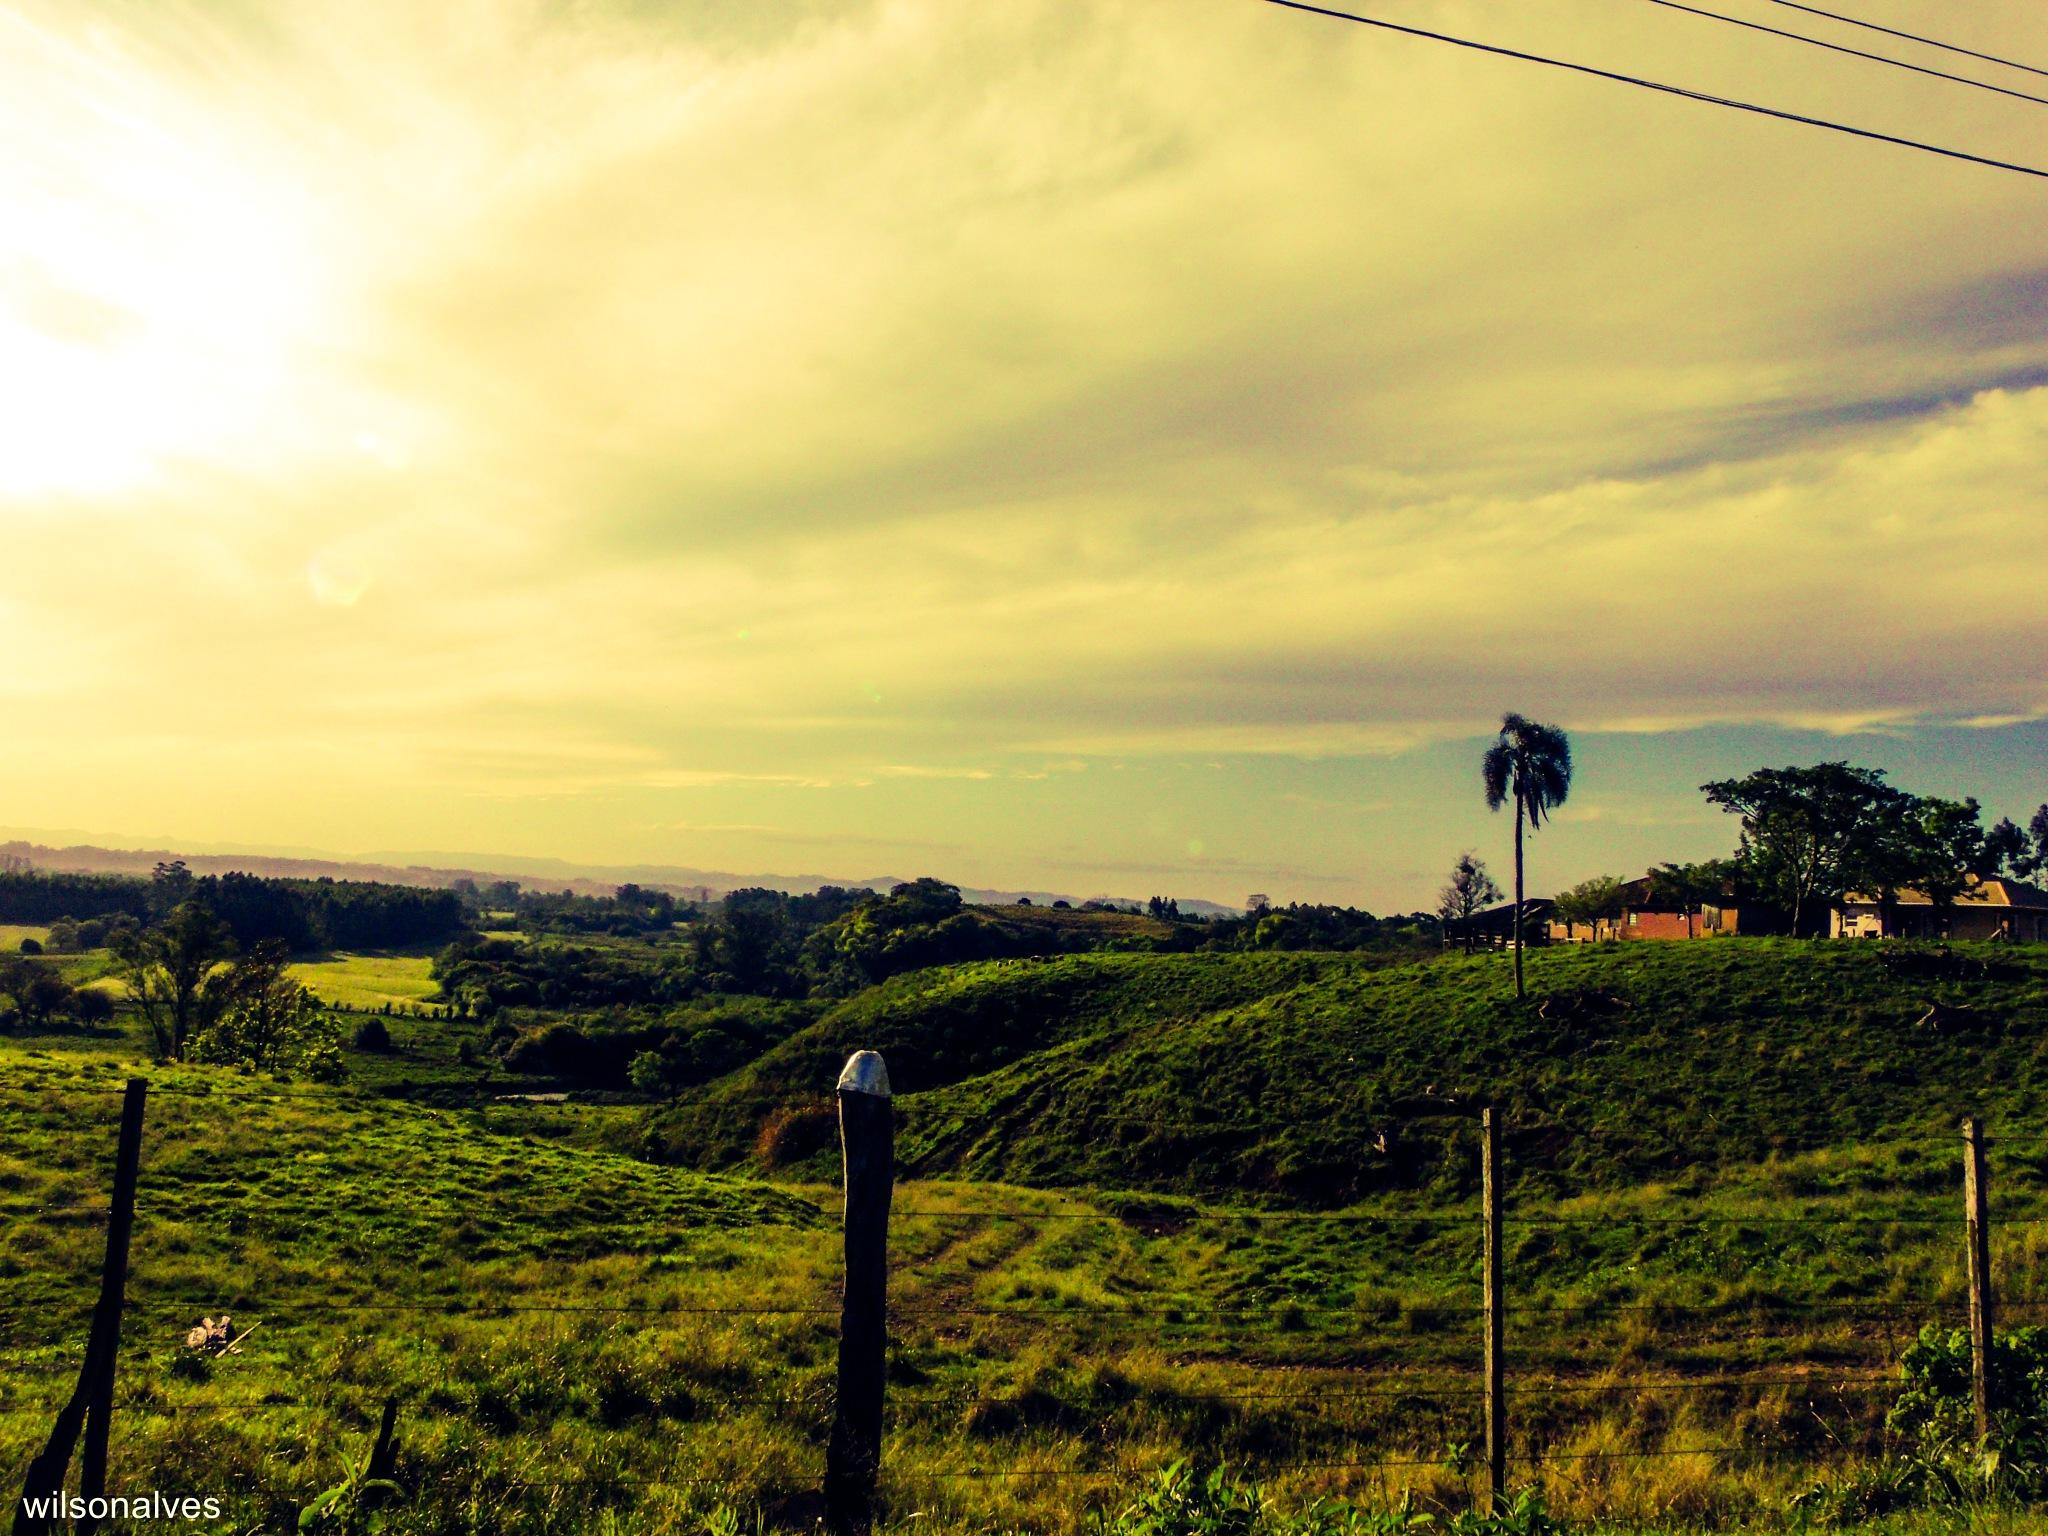 campos do sul do Brasil... by wilsonalves